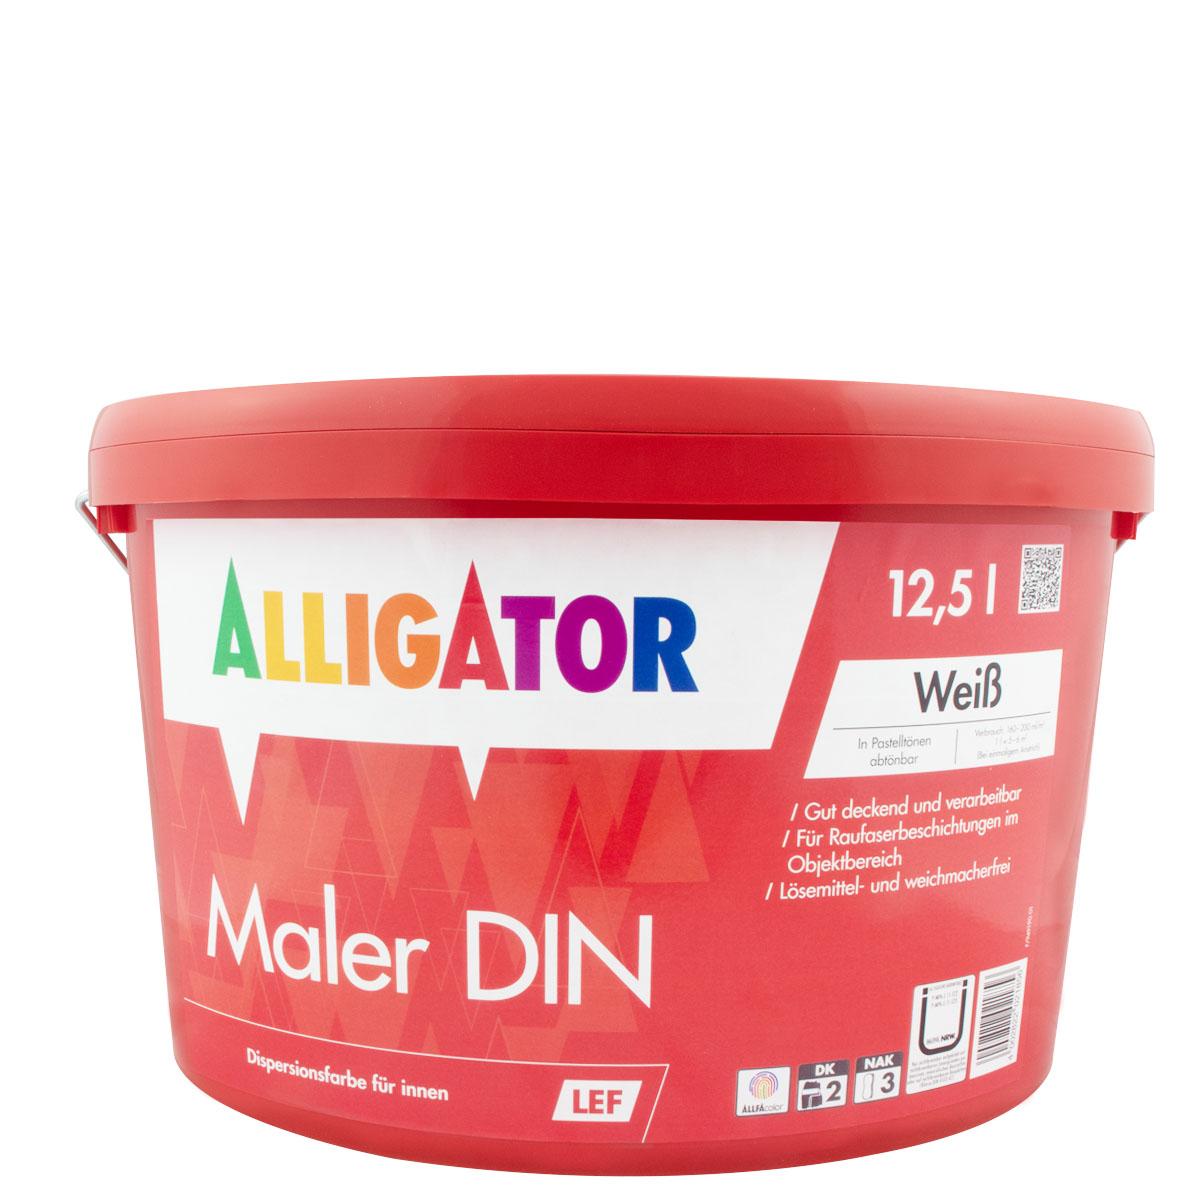 Alligator Maler DIN LEF 12,5L reinweiss RAL9010, Dispersions-Innenfarbe